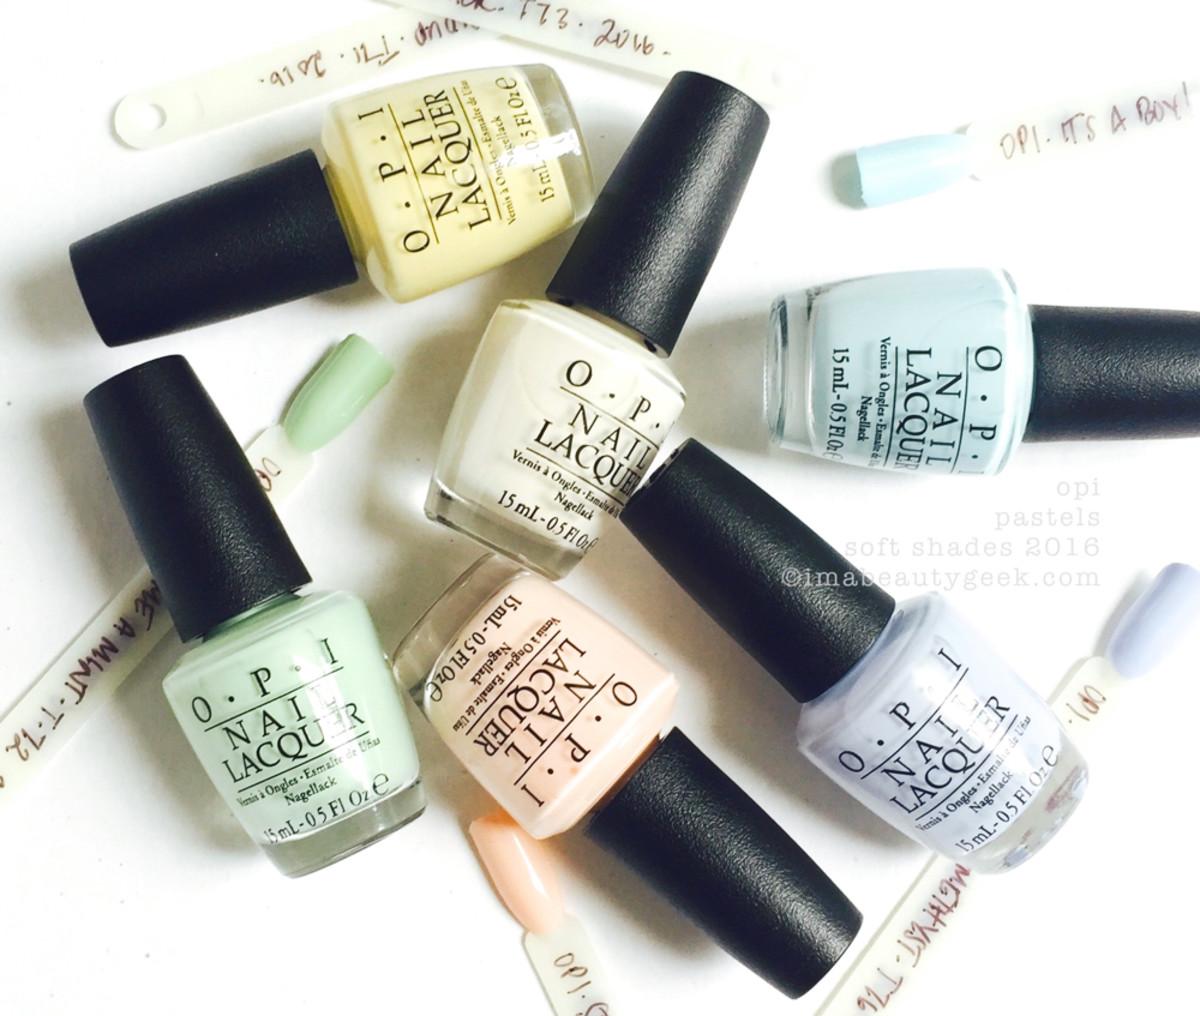 OPI Soft Shades 2016 Pastels - Version 2